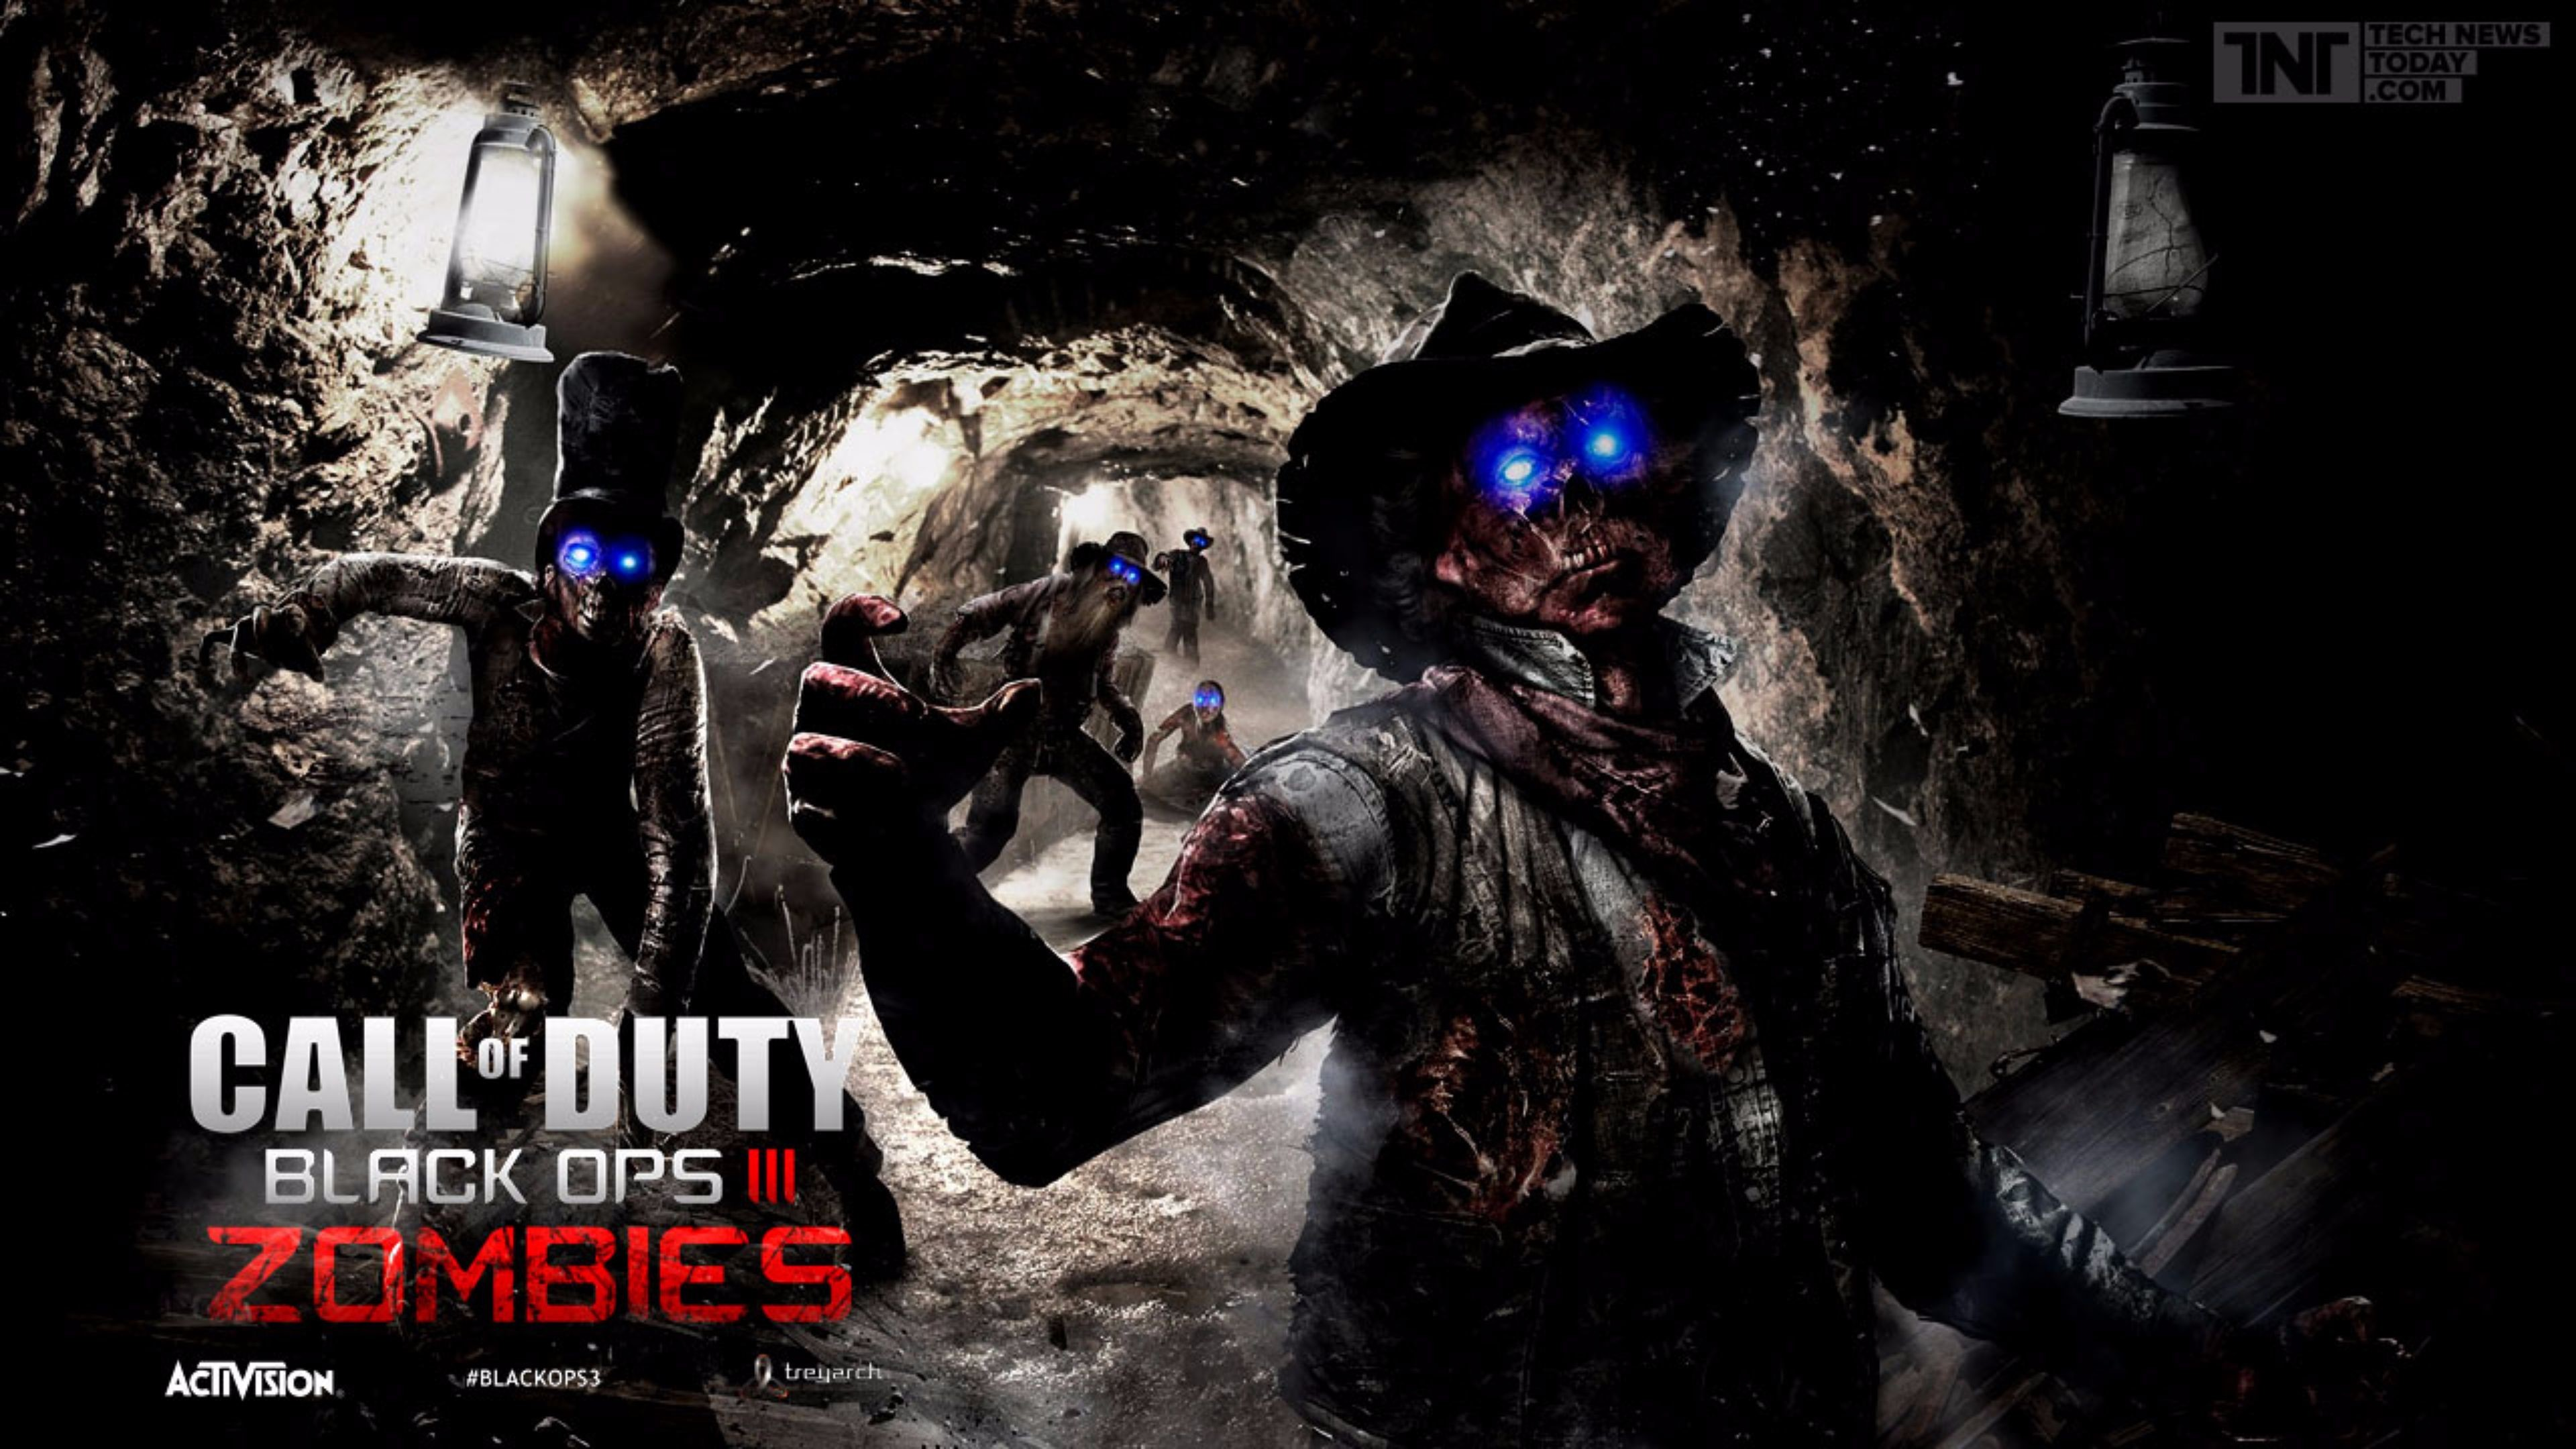 New Zombies Call of Duty Black Ops 3 4K Wallpaper | Free 4K Wallpaper